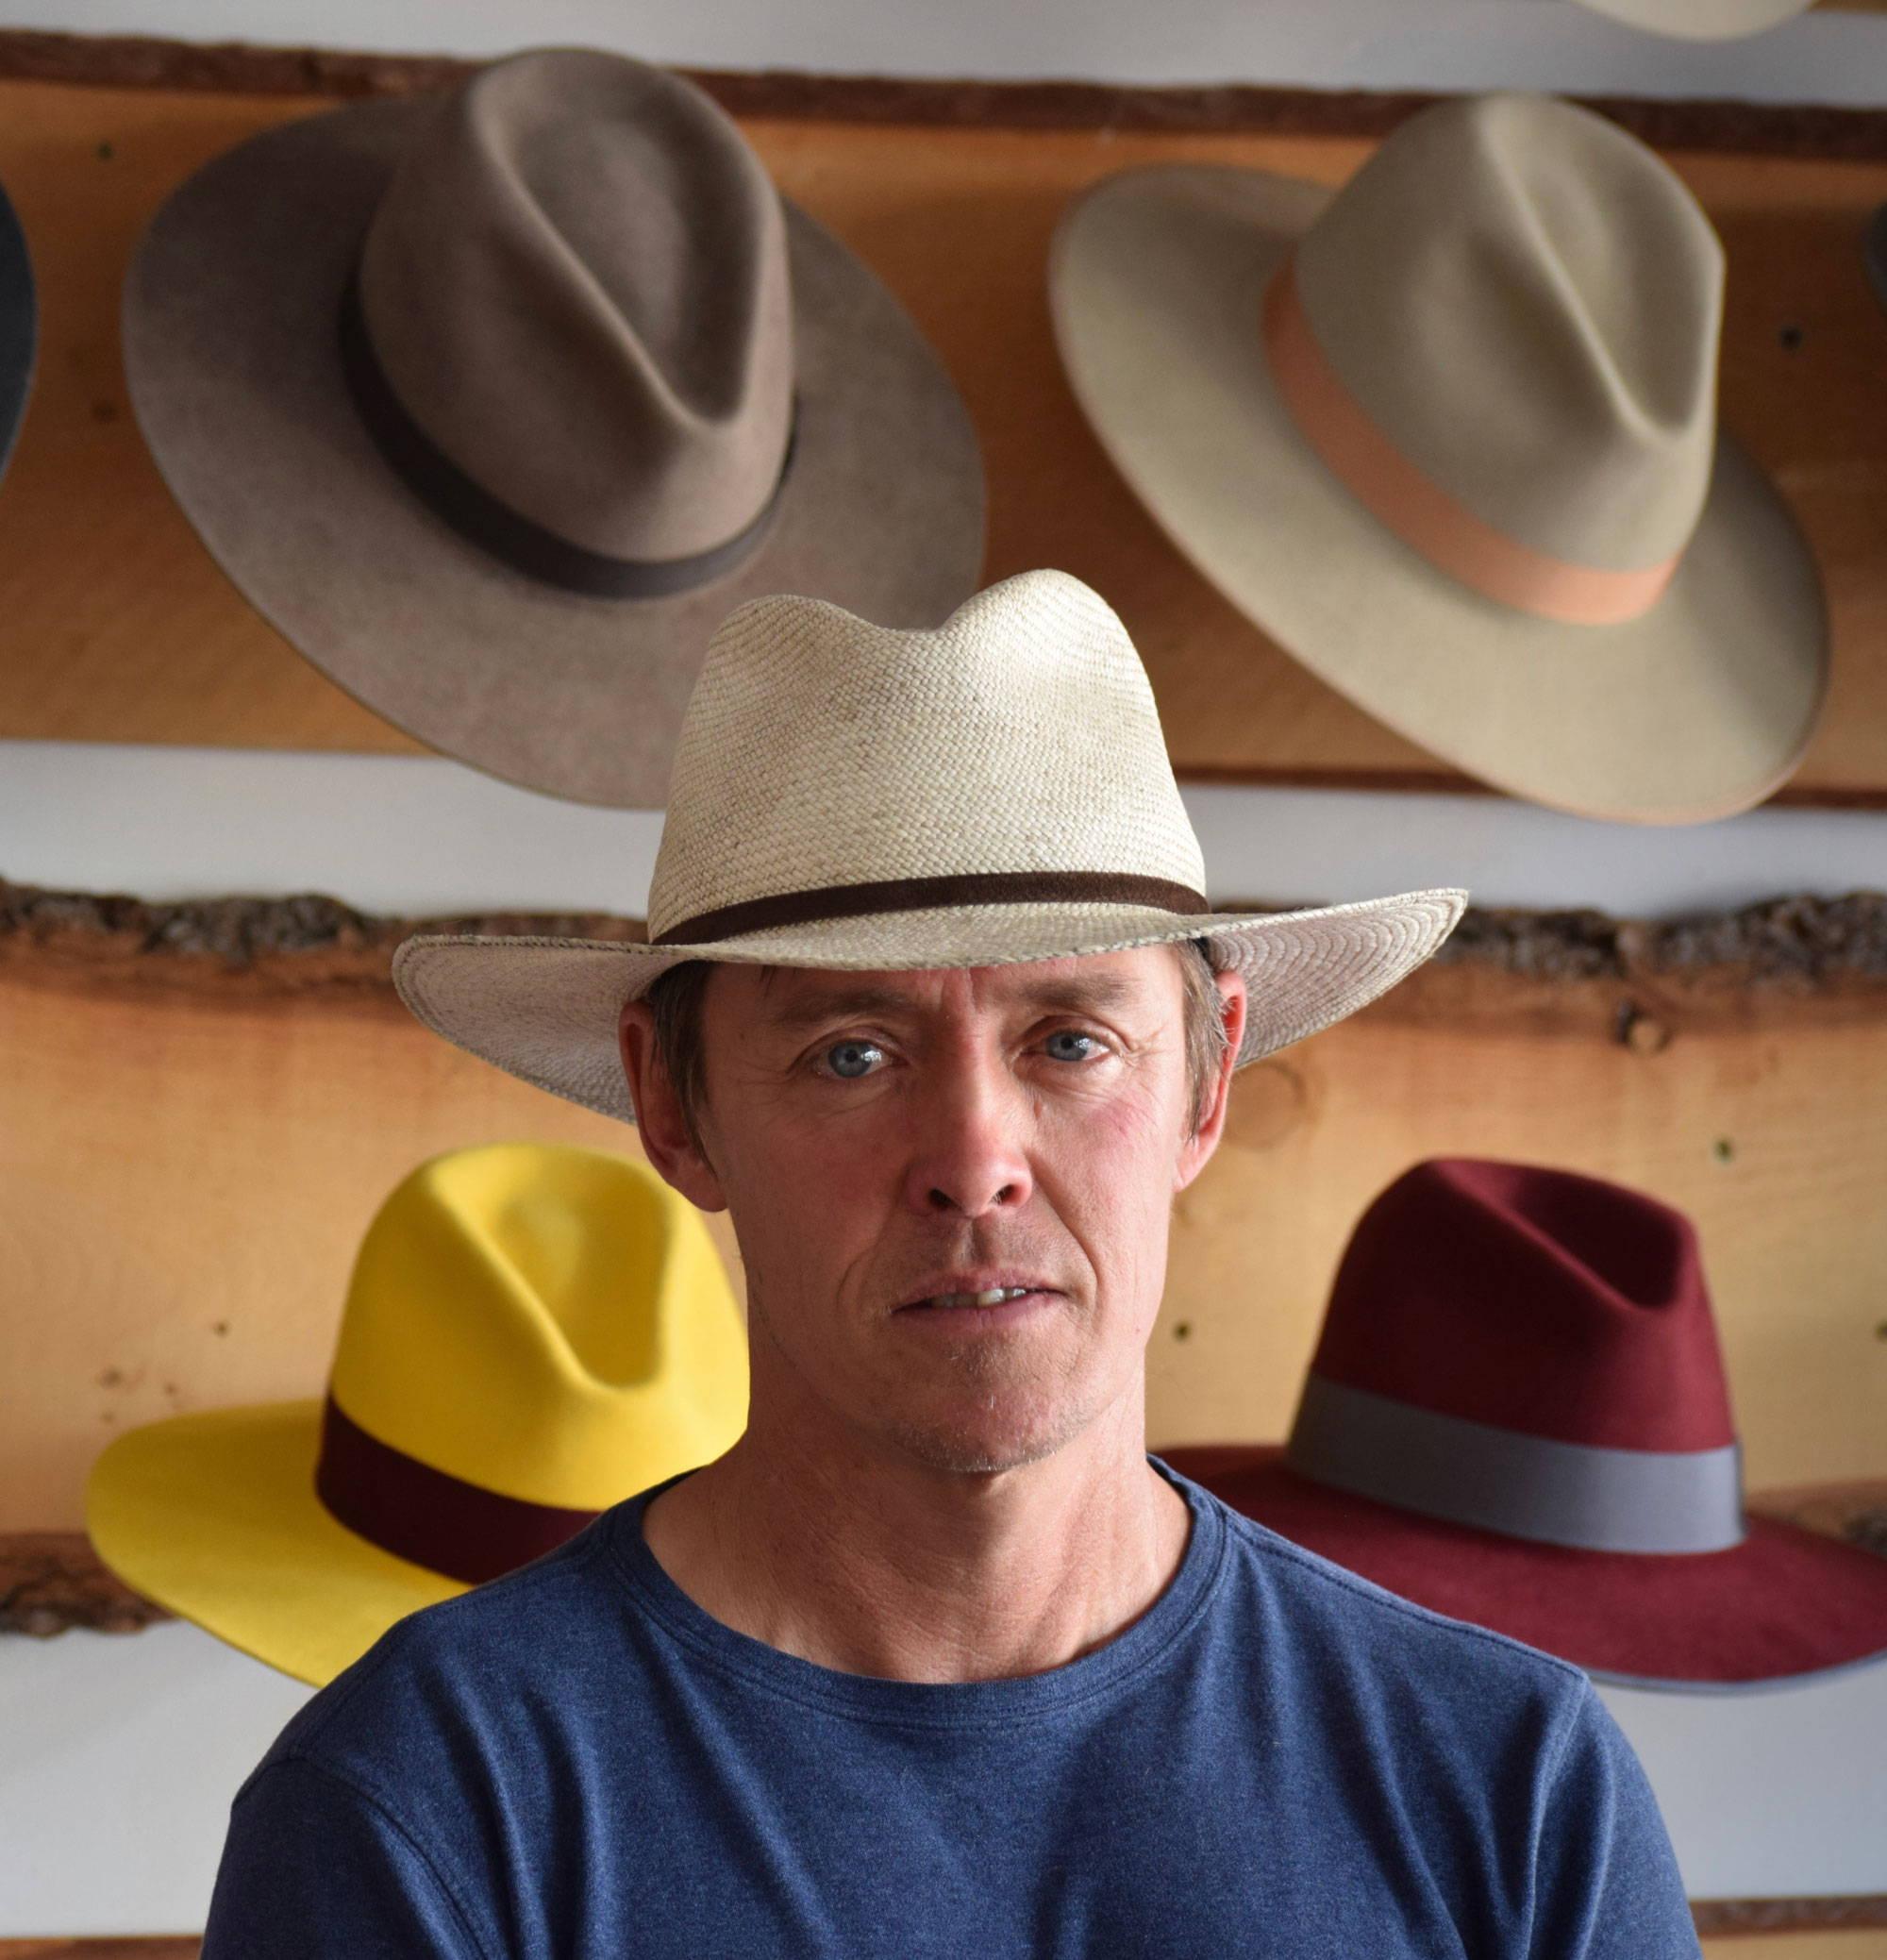 hat maker artist